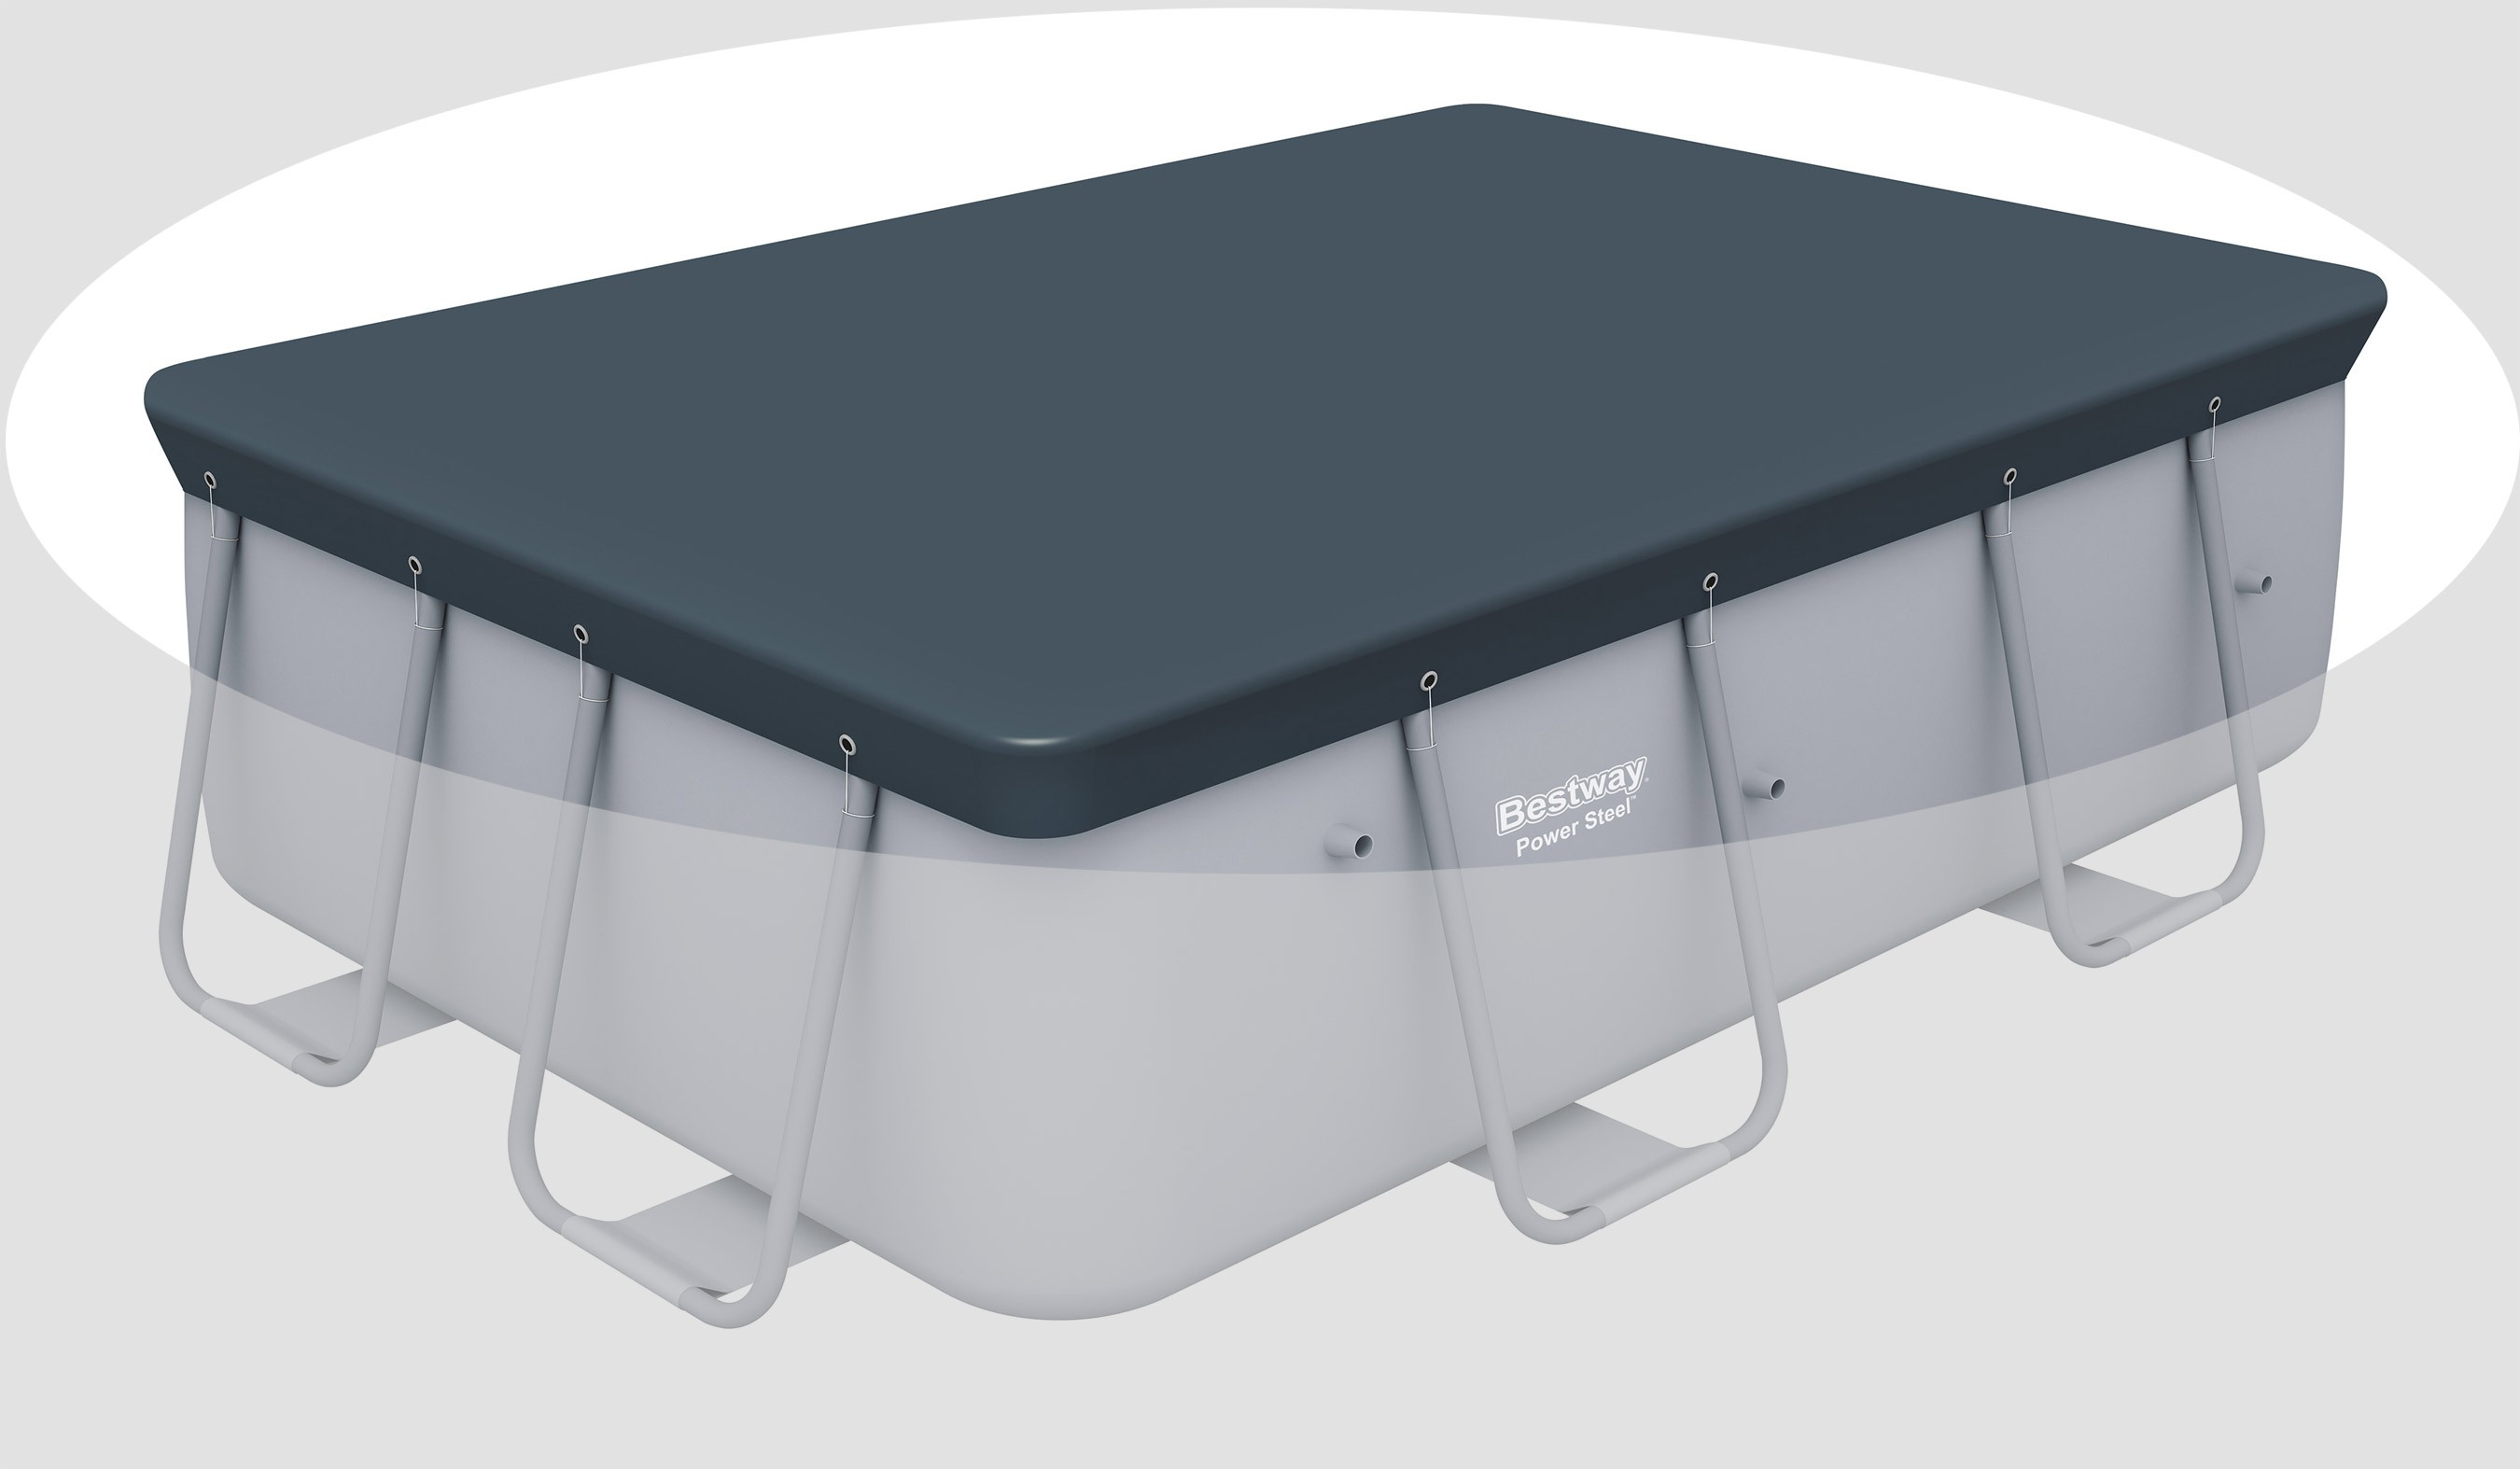 abdeckplane bestway f r frame pool 404 x 201 cm bei. Black Bedroom Furniture Sets. Home Design Ideas